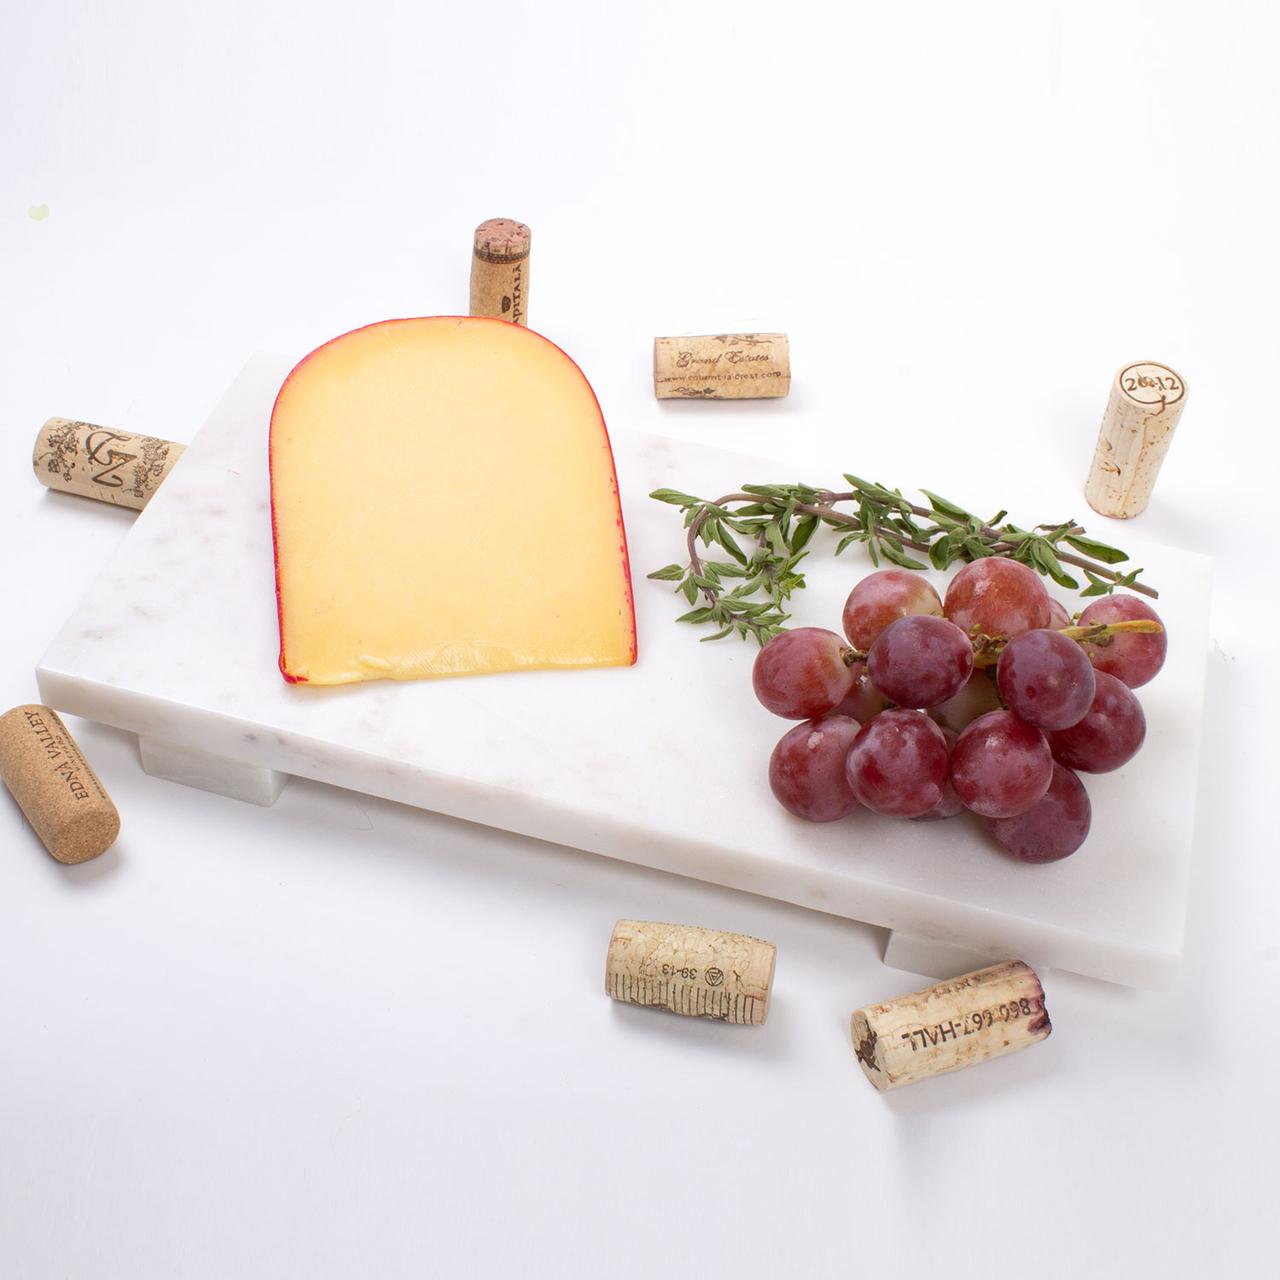 8 Oak Lane White Marble Cheese Boards